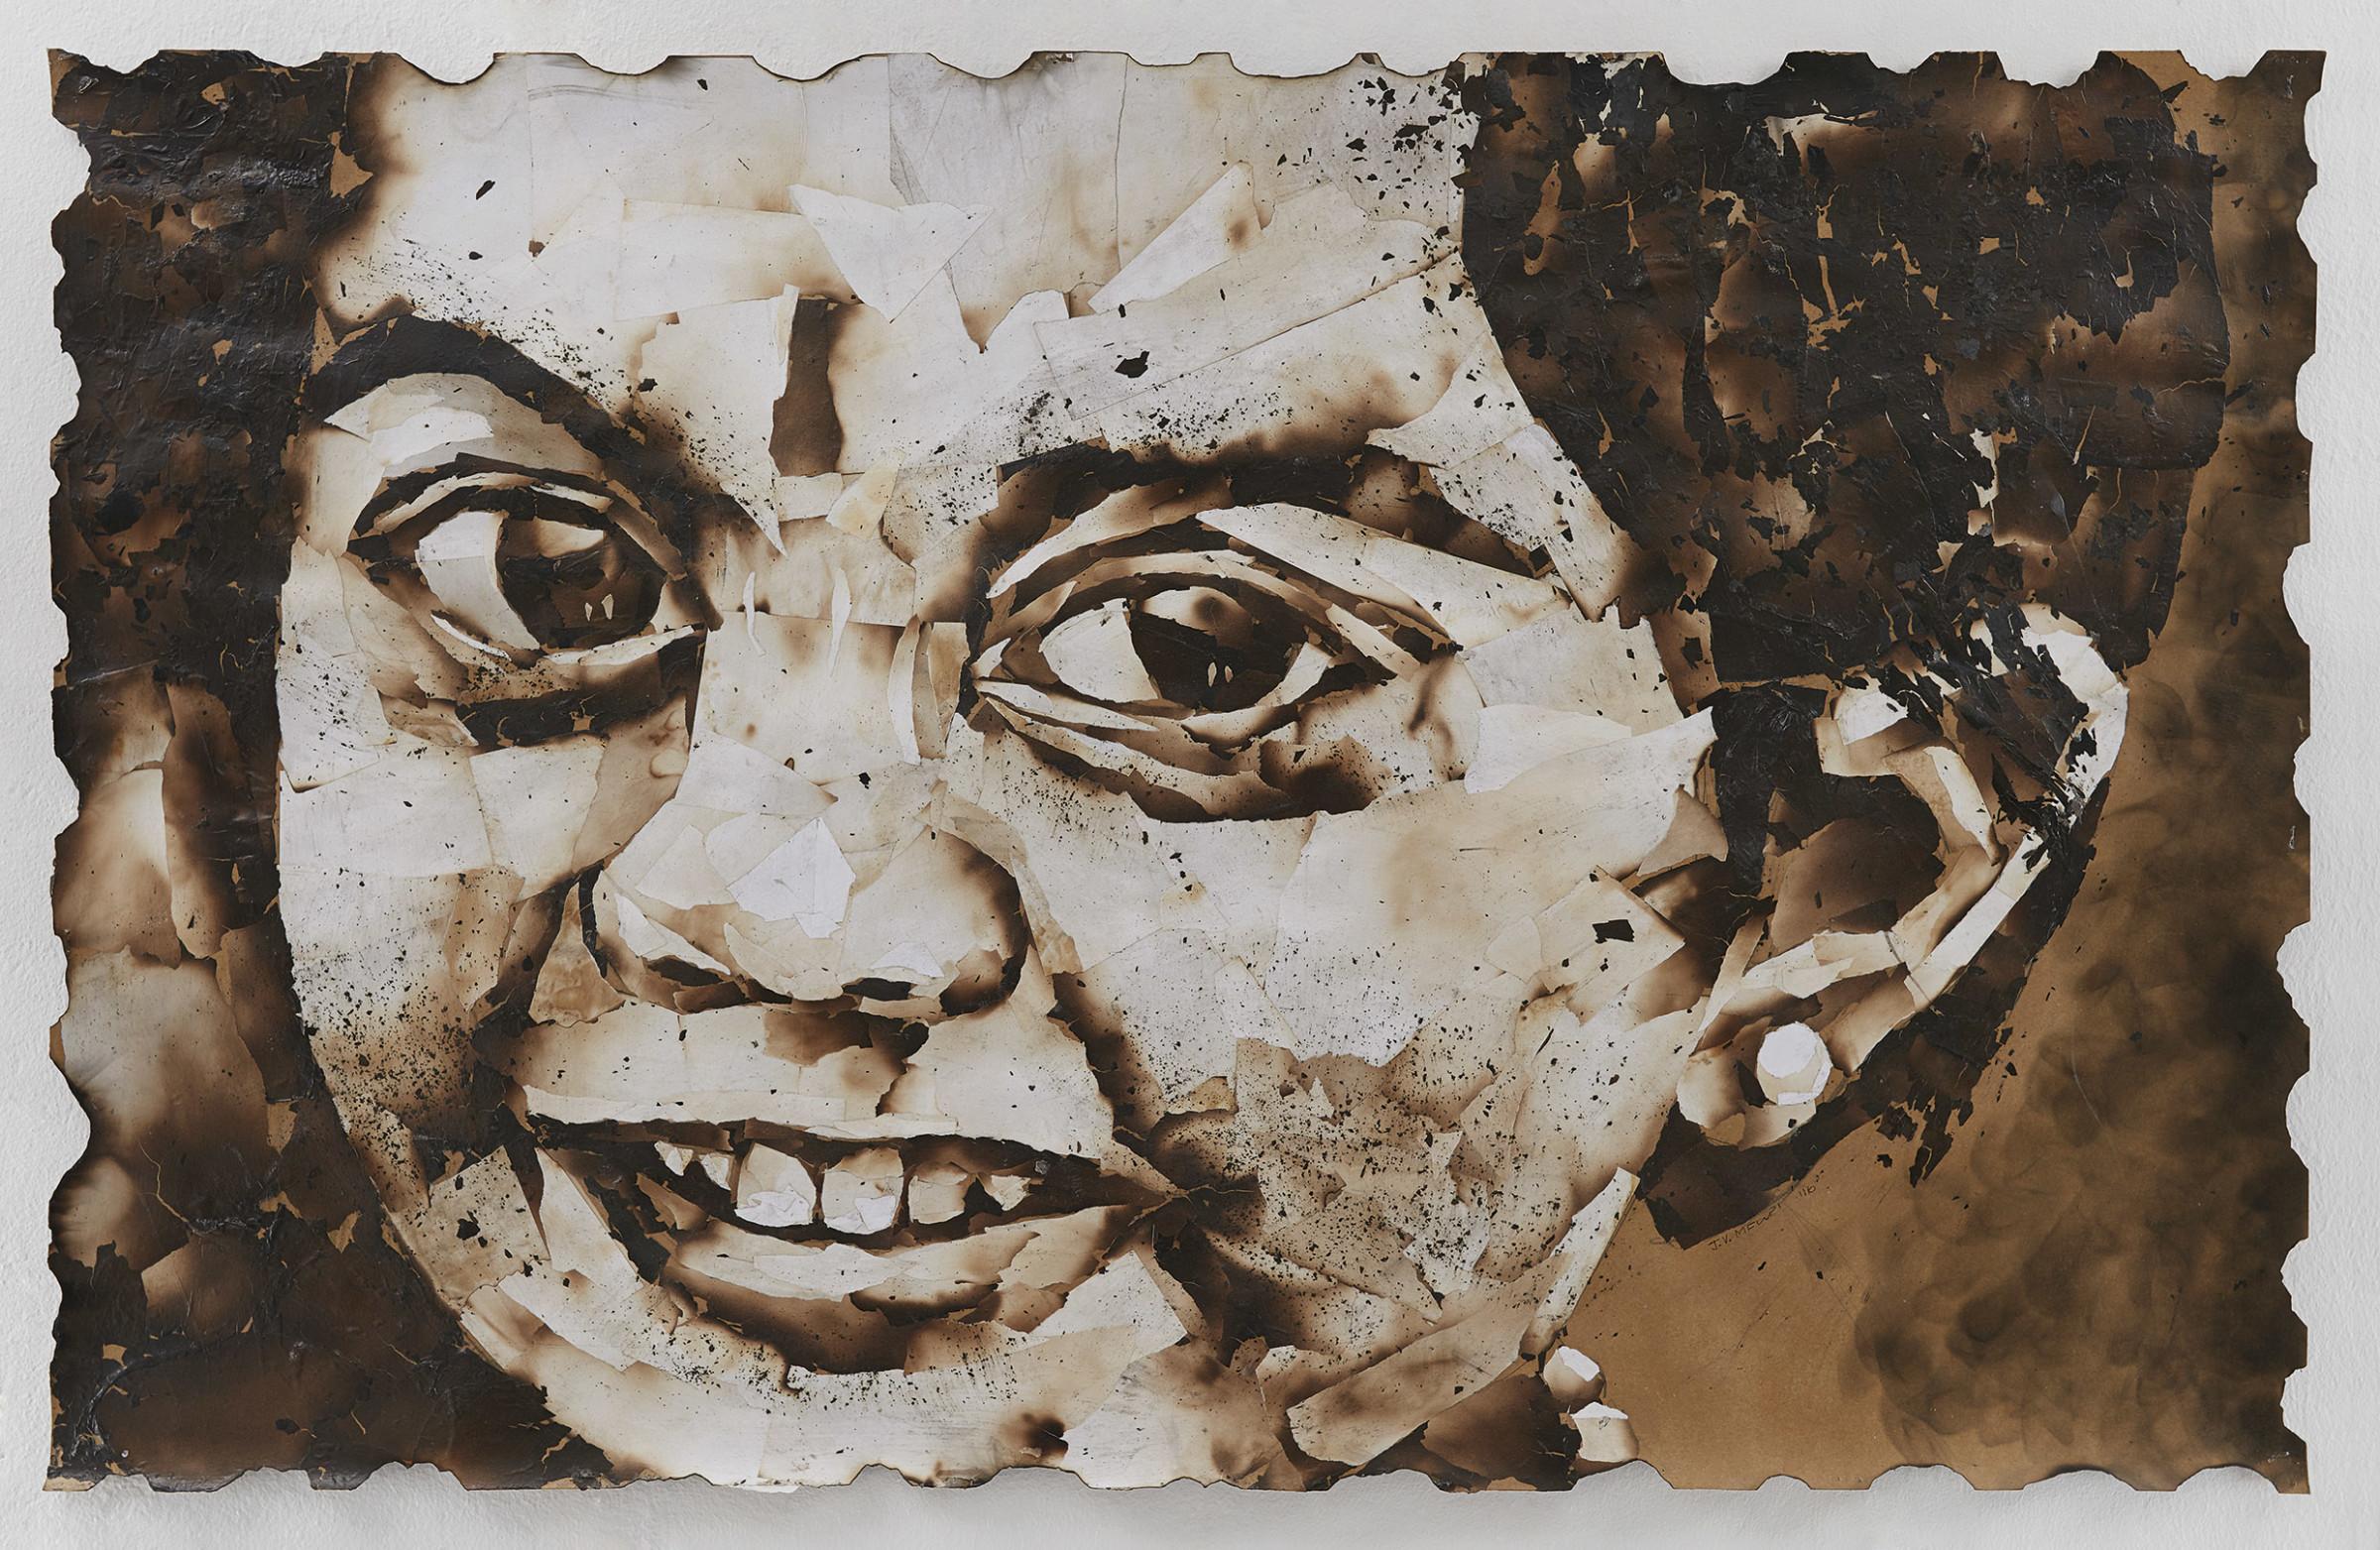 "<span class=""link fancybox-details-link""><a href=""/exhibitions/24/works/artworks2094/"">View Detail Page</a></span><div class=""artist""><strong>John Vusi Mfupi</strong></div> 1977-<div class=""title""><em>The Sun Shines Bright</em>, 2016</div><div class=""medium"">burned paper collage</div><div class=""dimensions"">120x76cm</div>"